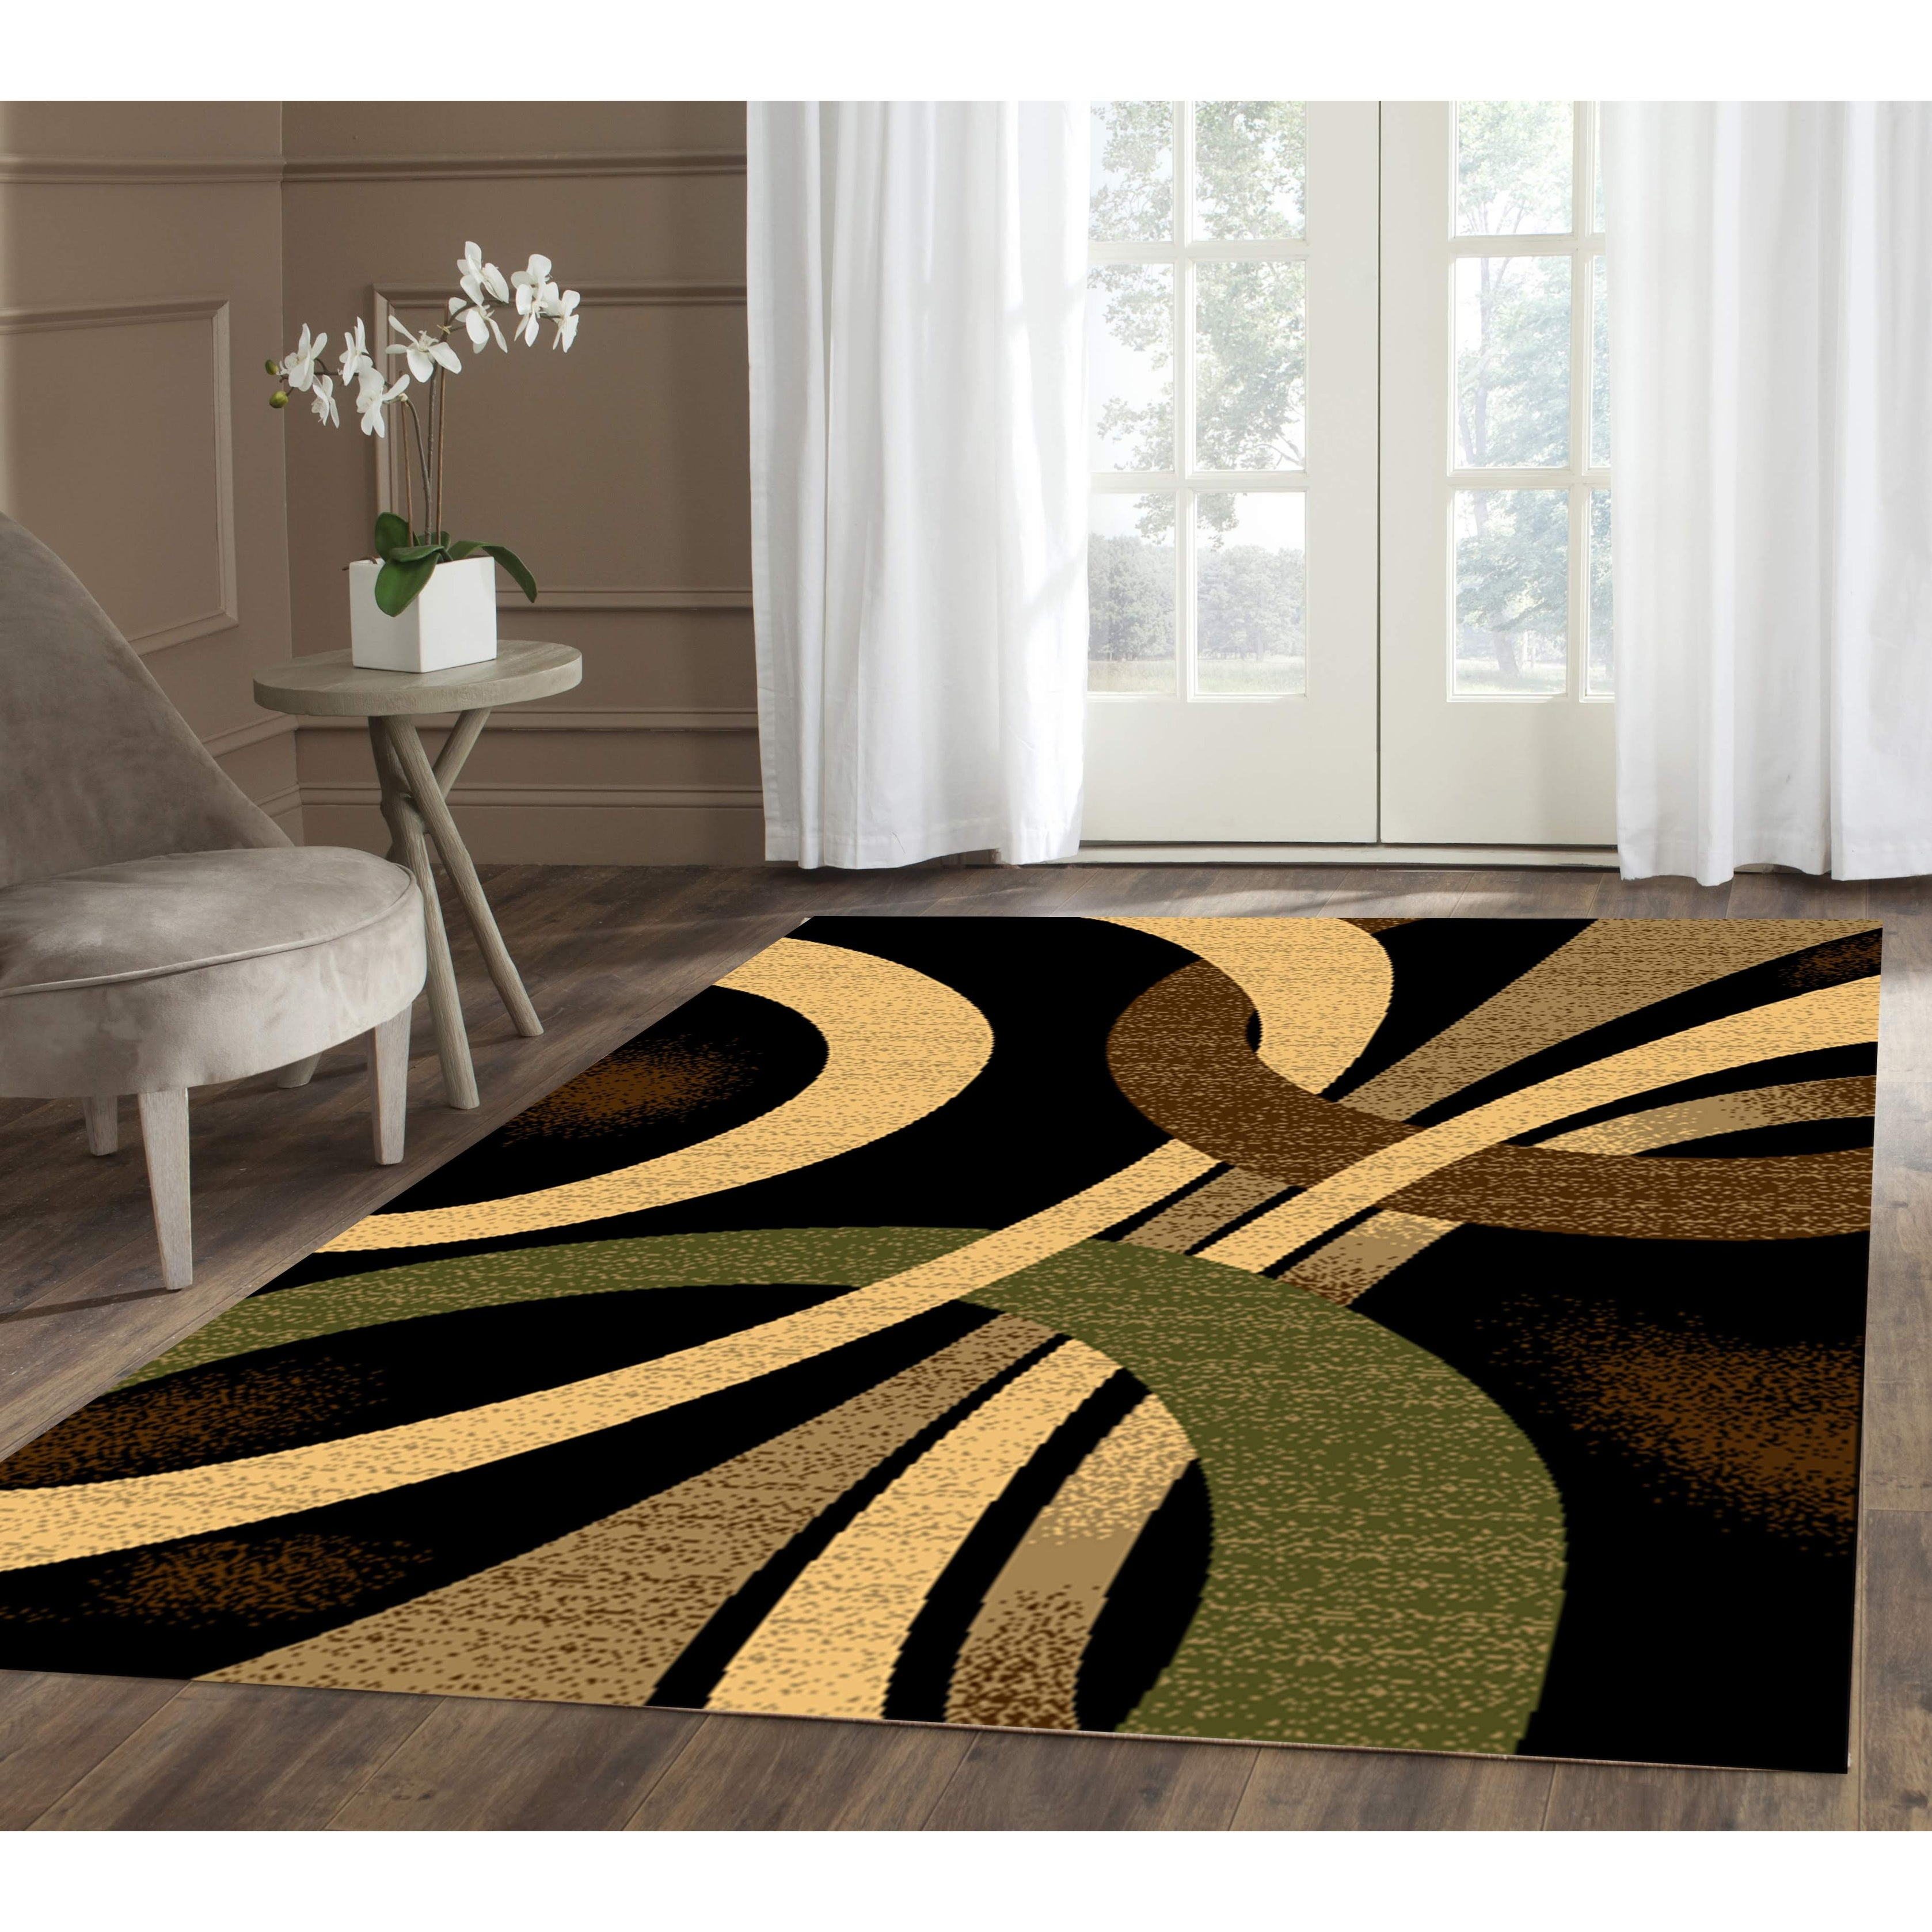 Coleen Abstract Black Beige Area Rug 8 Ft By 10 Ft 8 X 10 Overstock 25452753